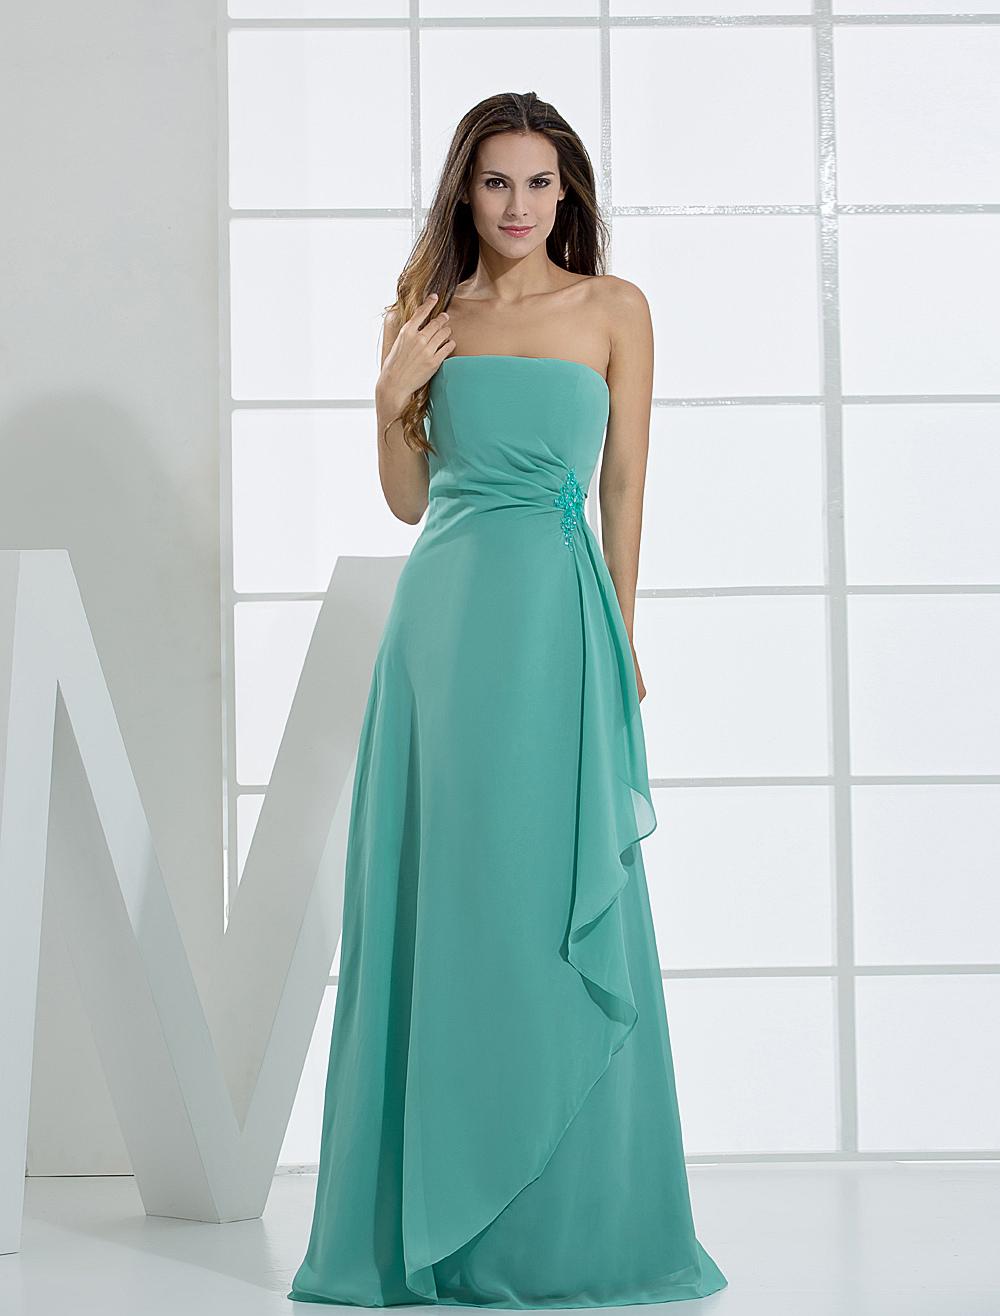 Romantic A-line Strapless Floor Length Chiffon Bridesmaid Dress